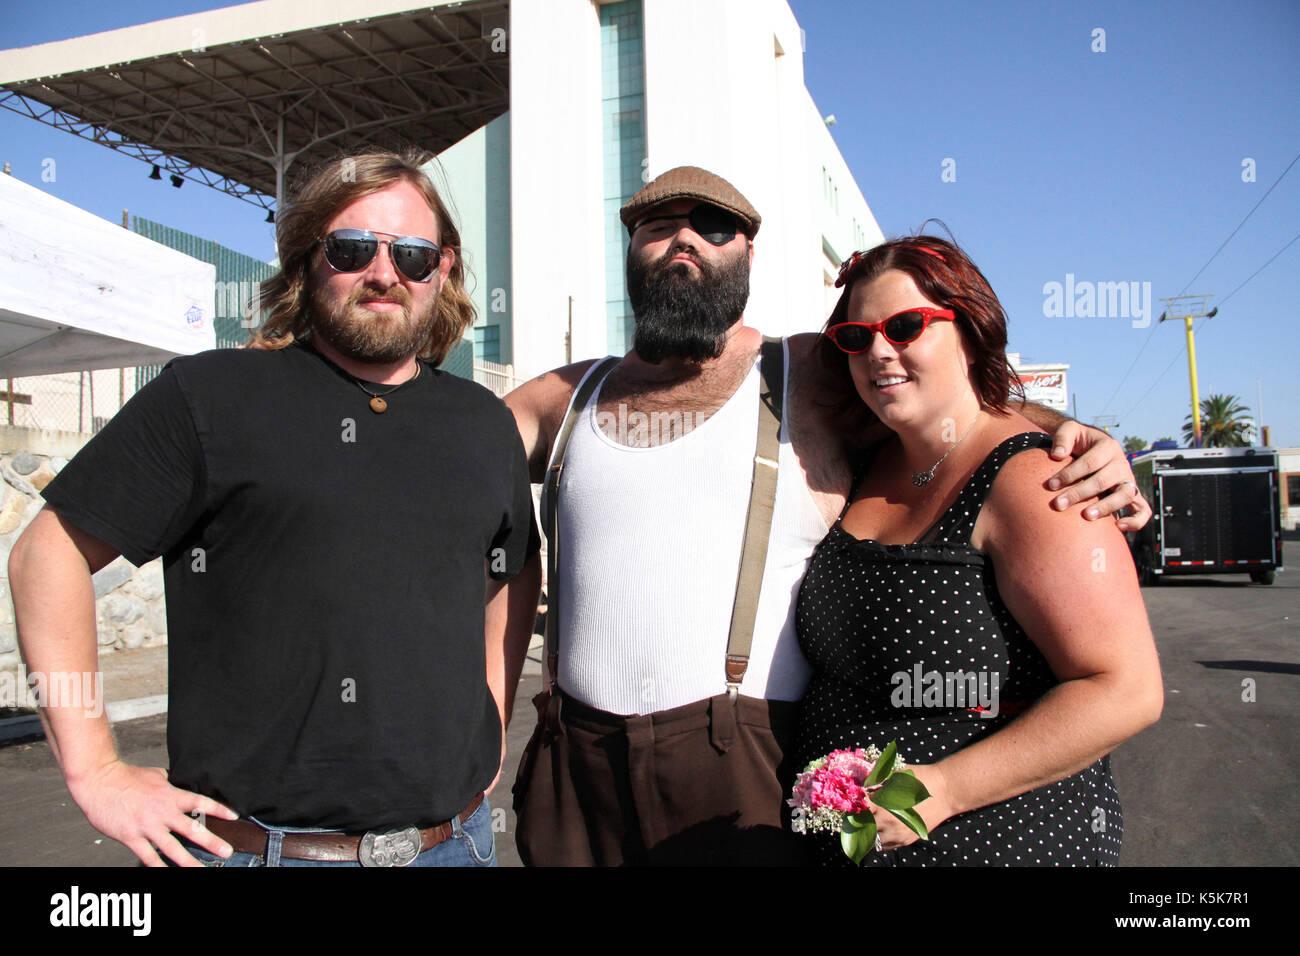 The Reverend Peyton's Big Damn Band backstage portrait 2010 Vans Warped Tour Fairplex Pomona,Ca. - Stock Image